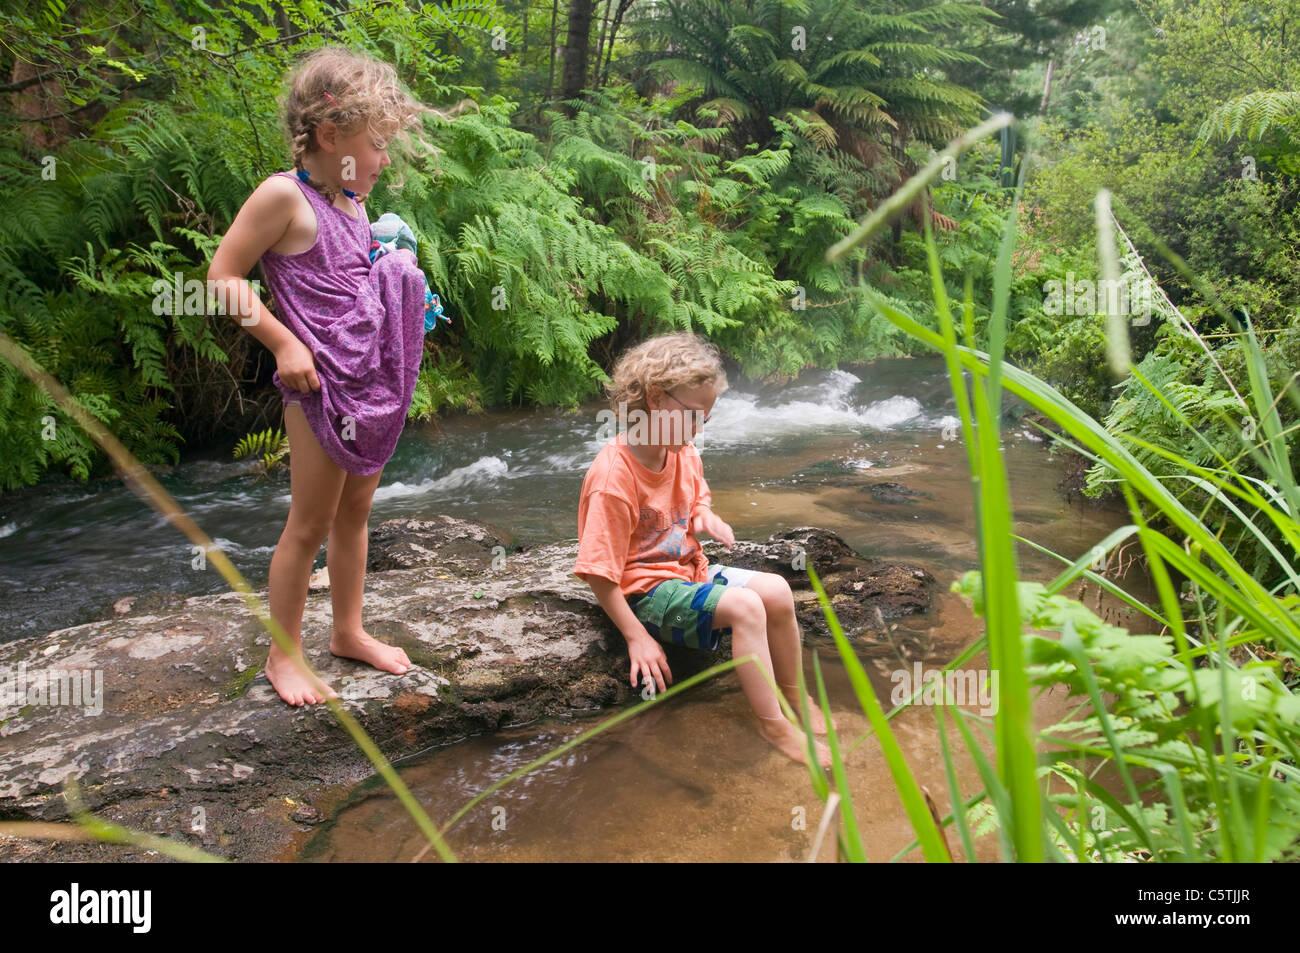 New Zealand, Rotorua, Kerosene Creek, Two Children (4-5) (6-7) on riverbank - Stock Image